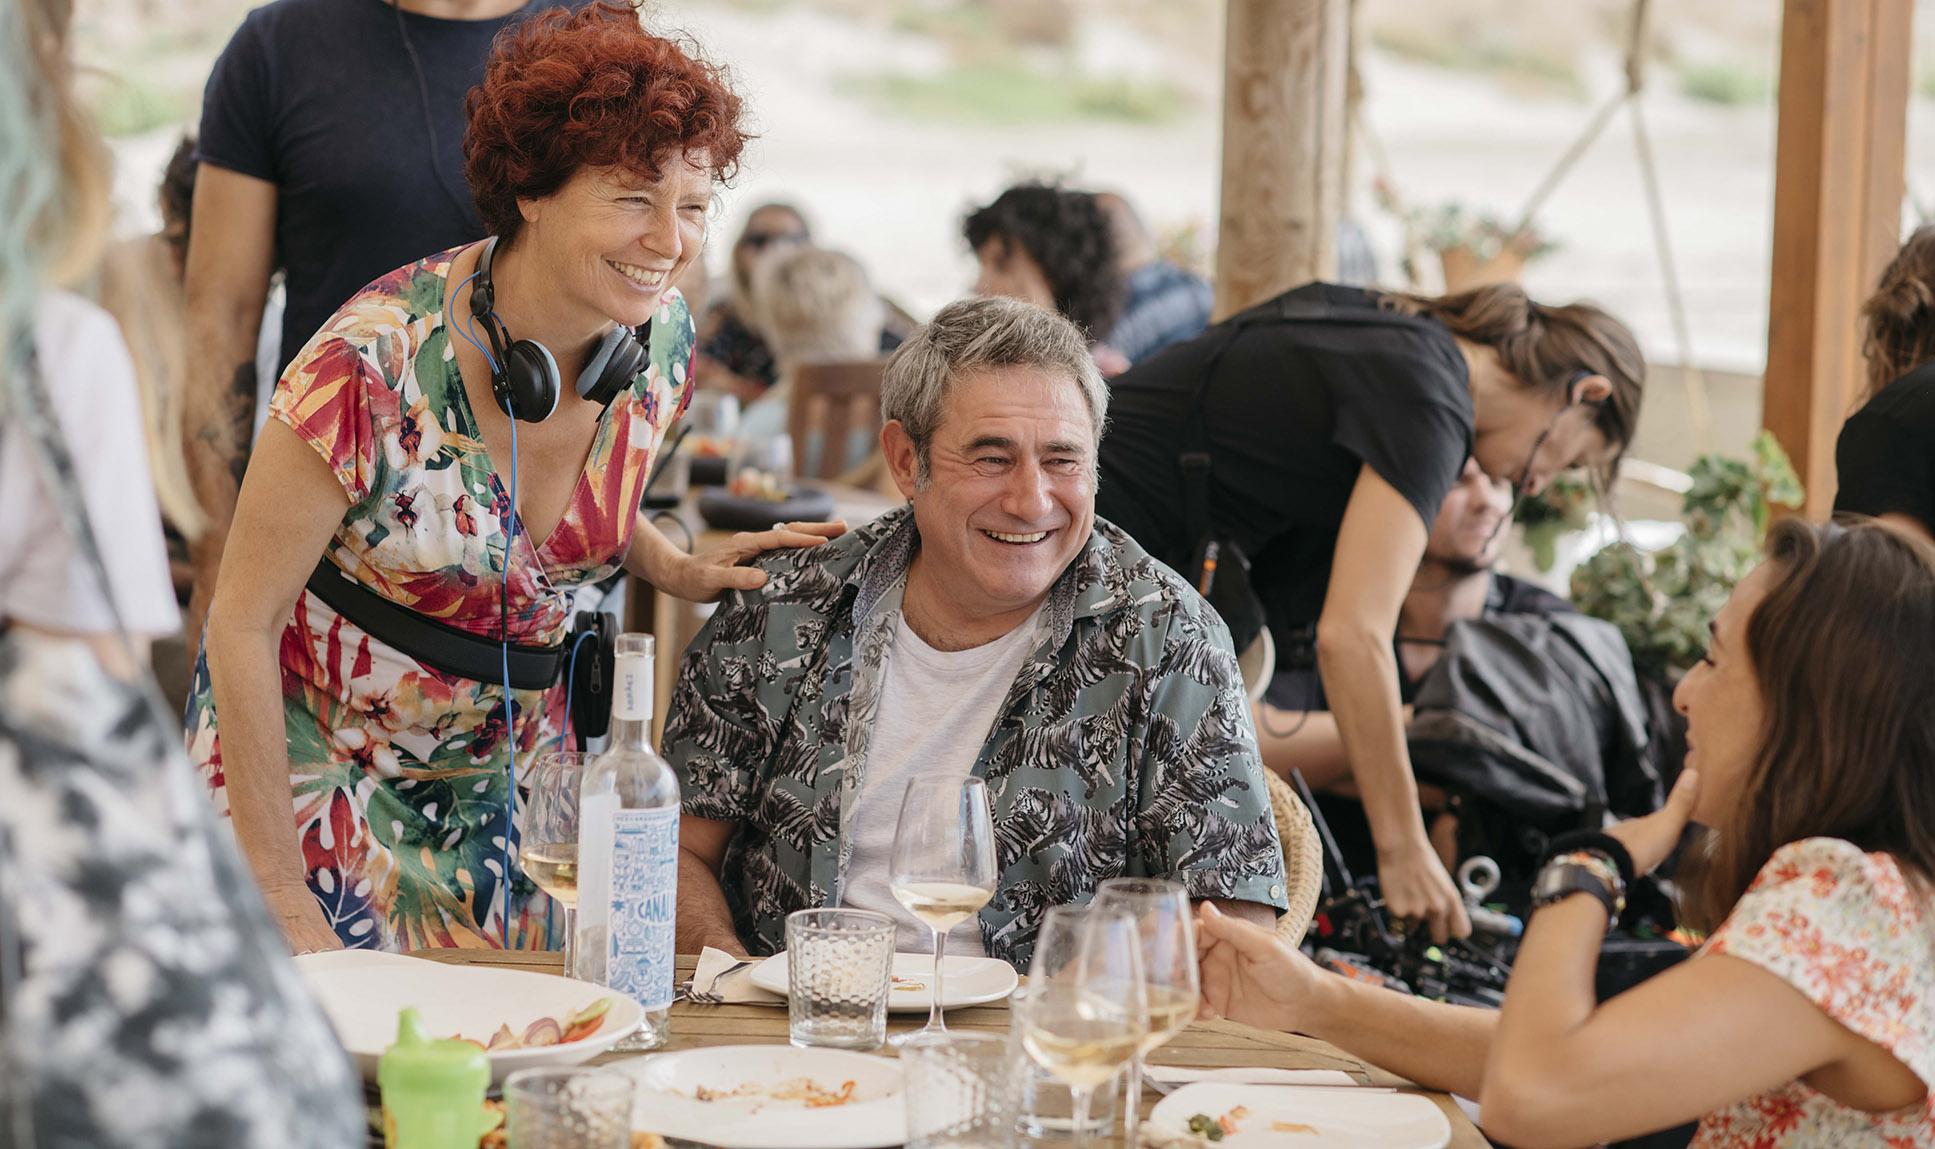 Rosa's Wedding [La boda de Rosa] — Moro Spanish Film Festival 2021